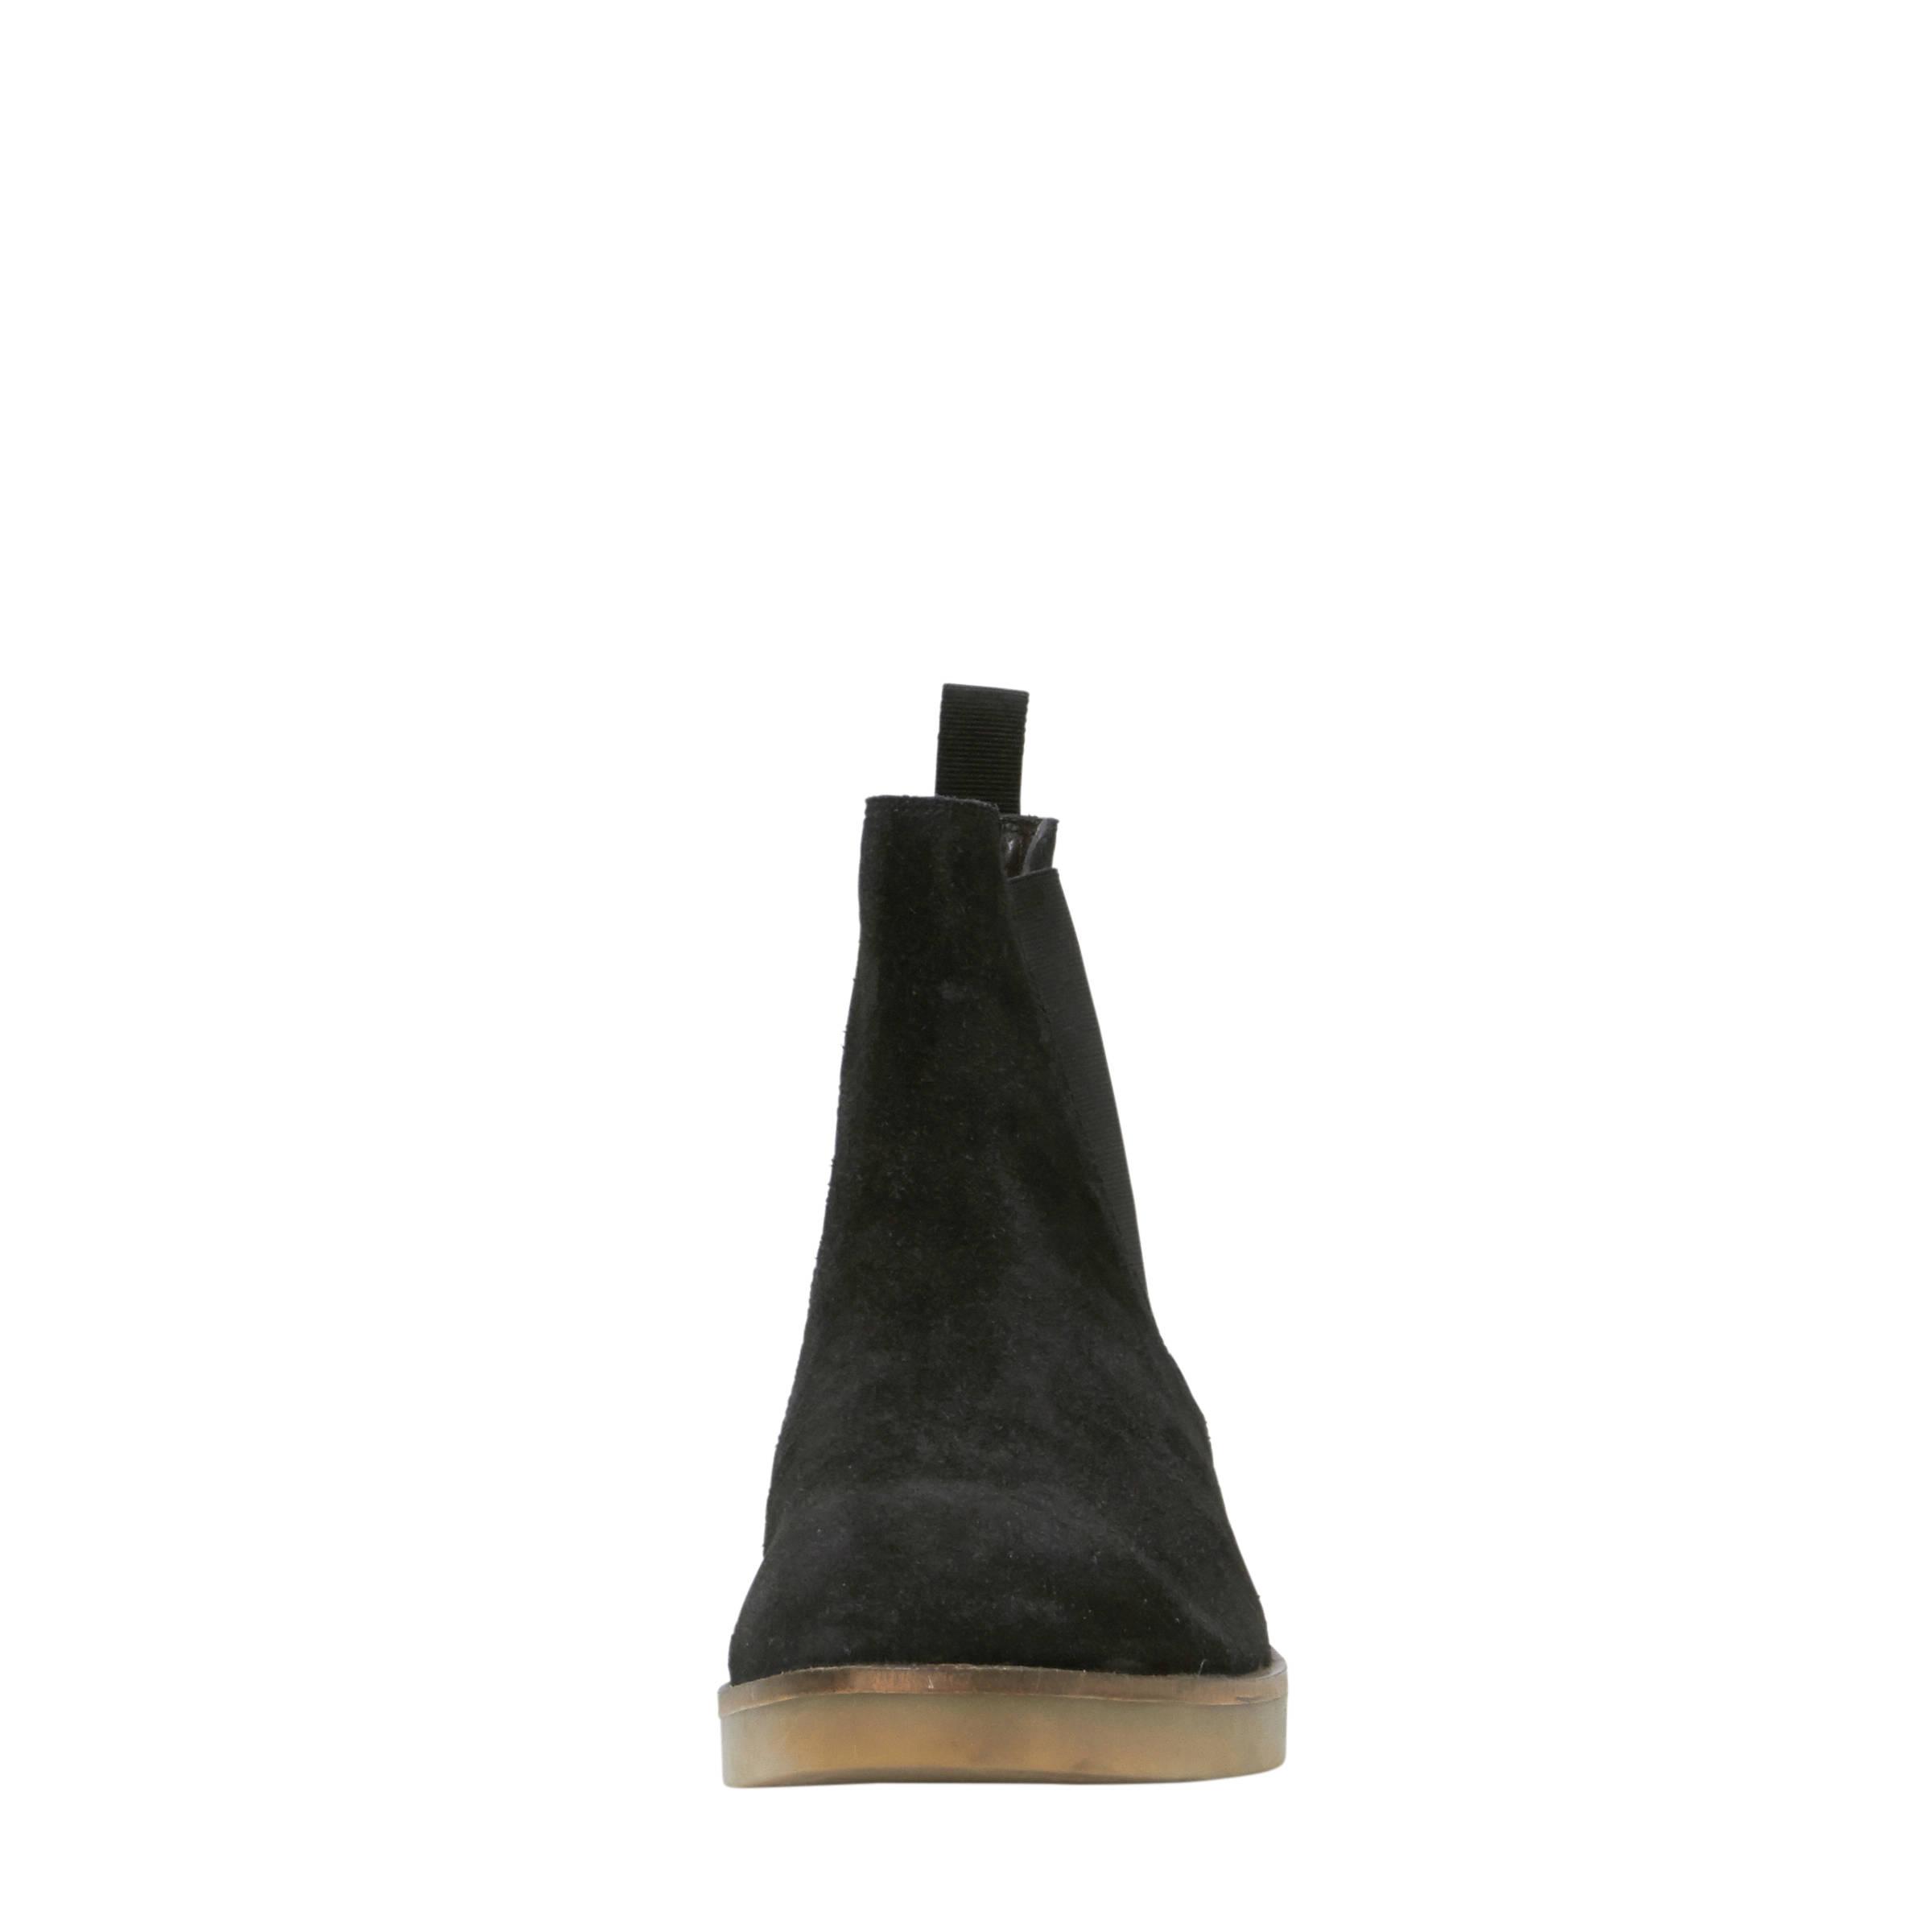 40b635b4eb4f99 Mexx suède chelsea boots zwart